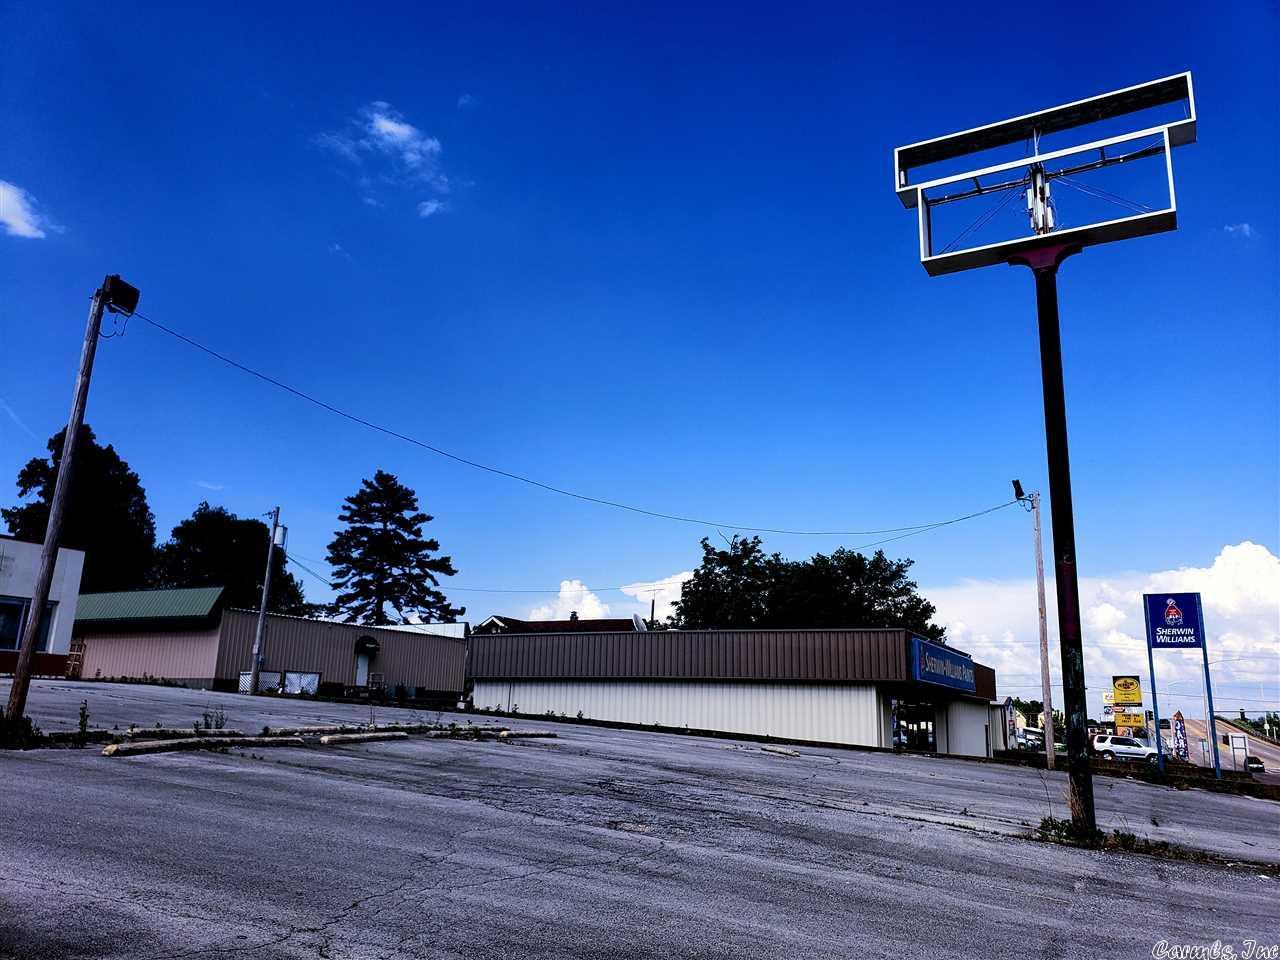 401 West Kingshighway #No, Paragould, AR 72450